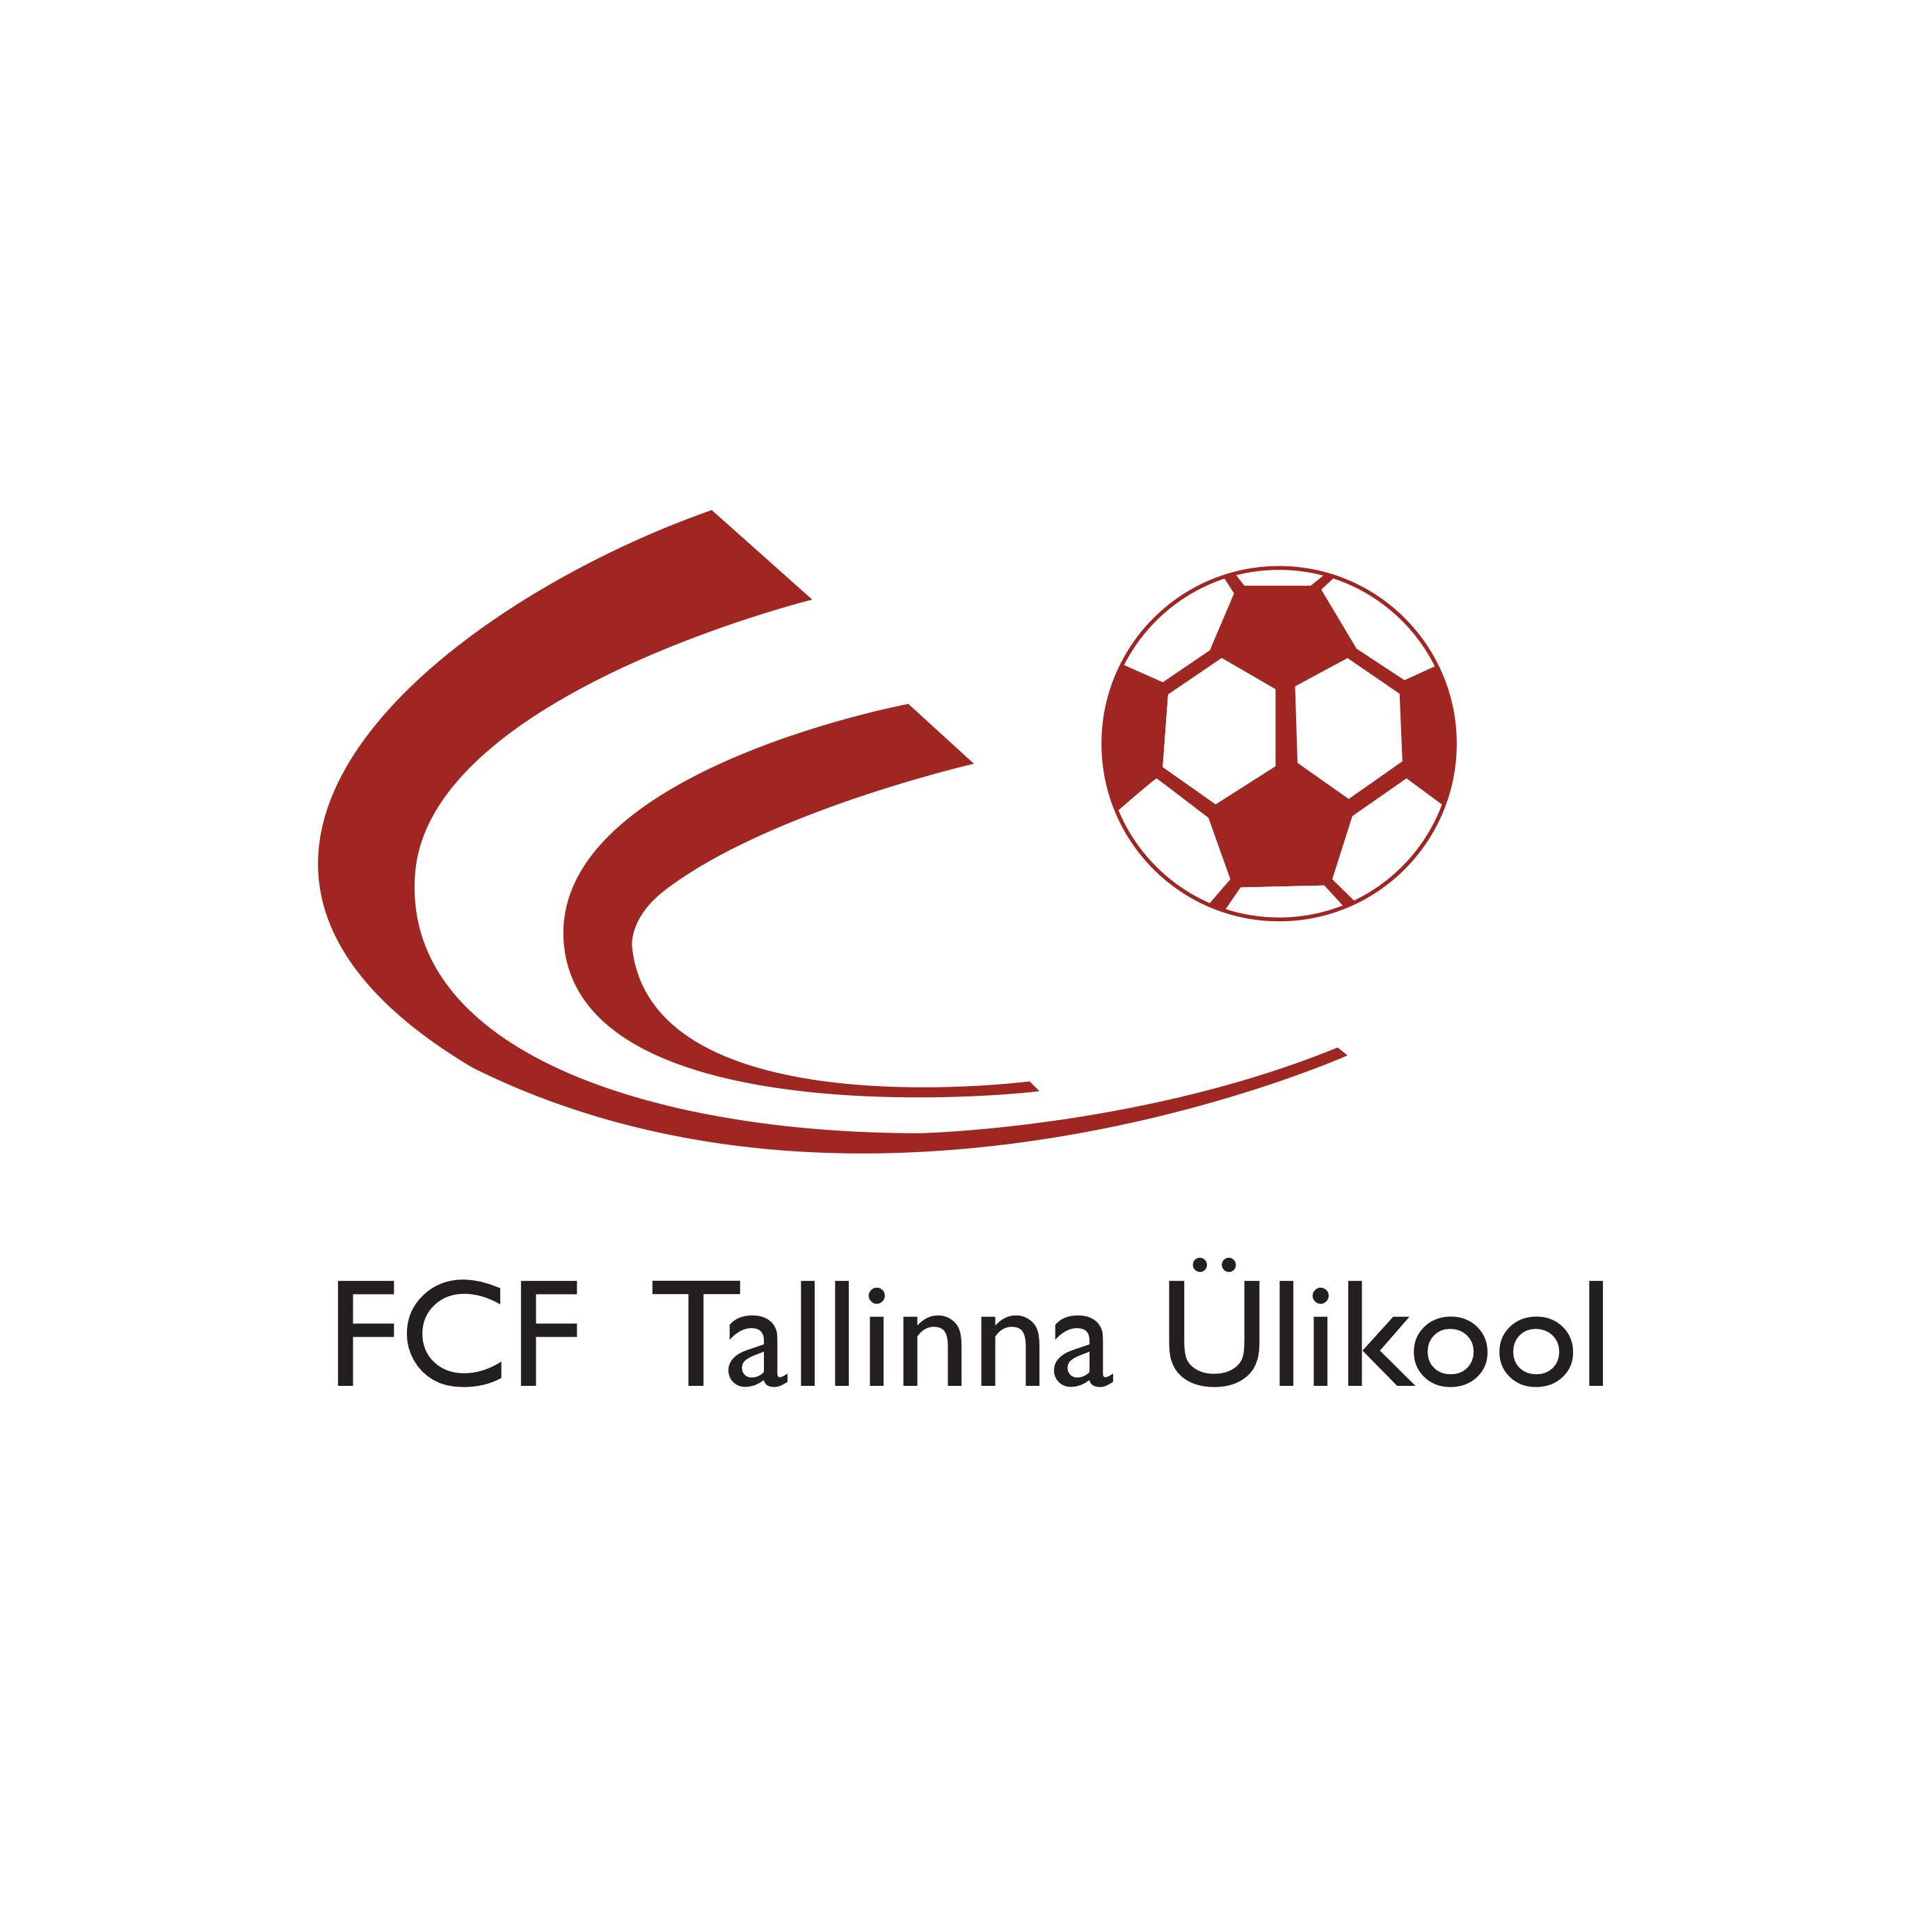 FCF Tallinna Ülikool